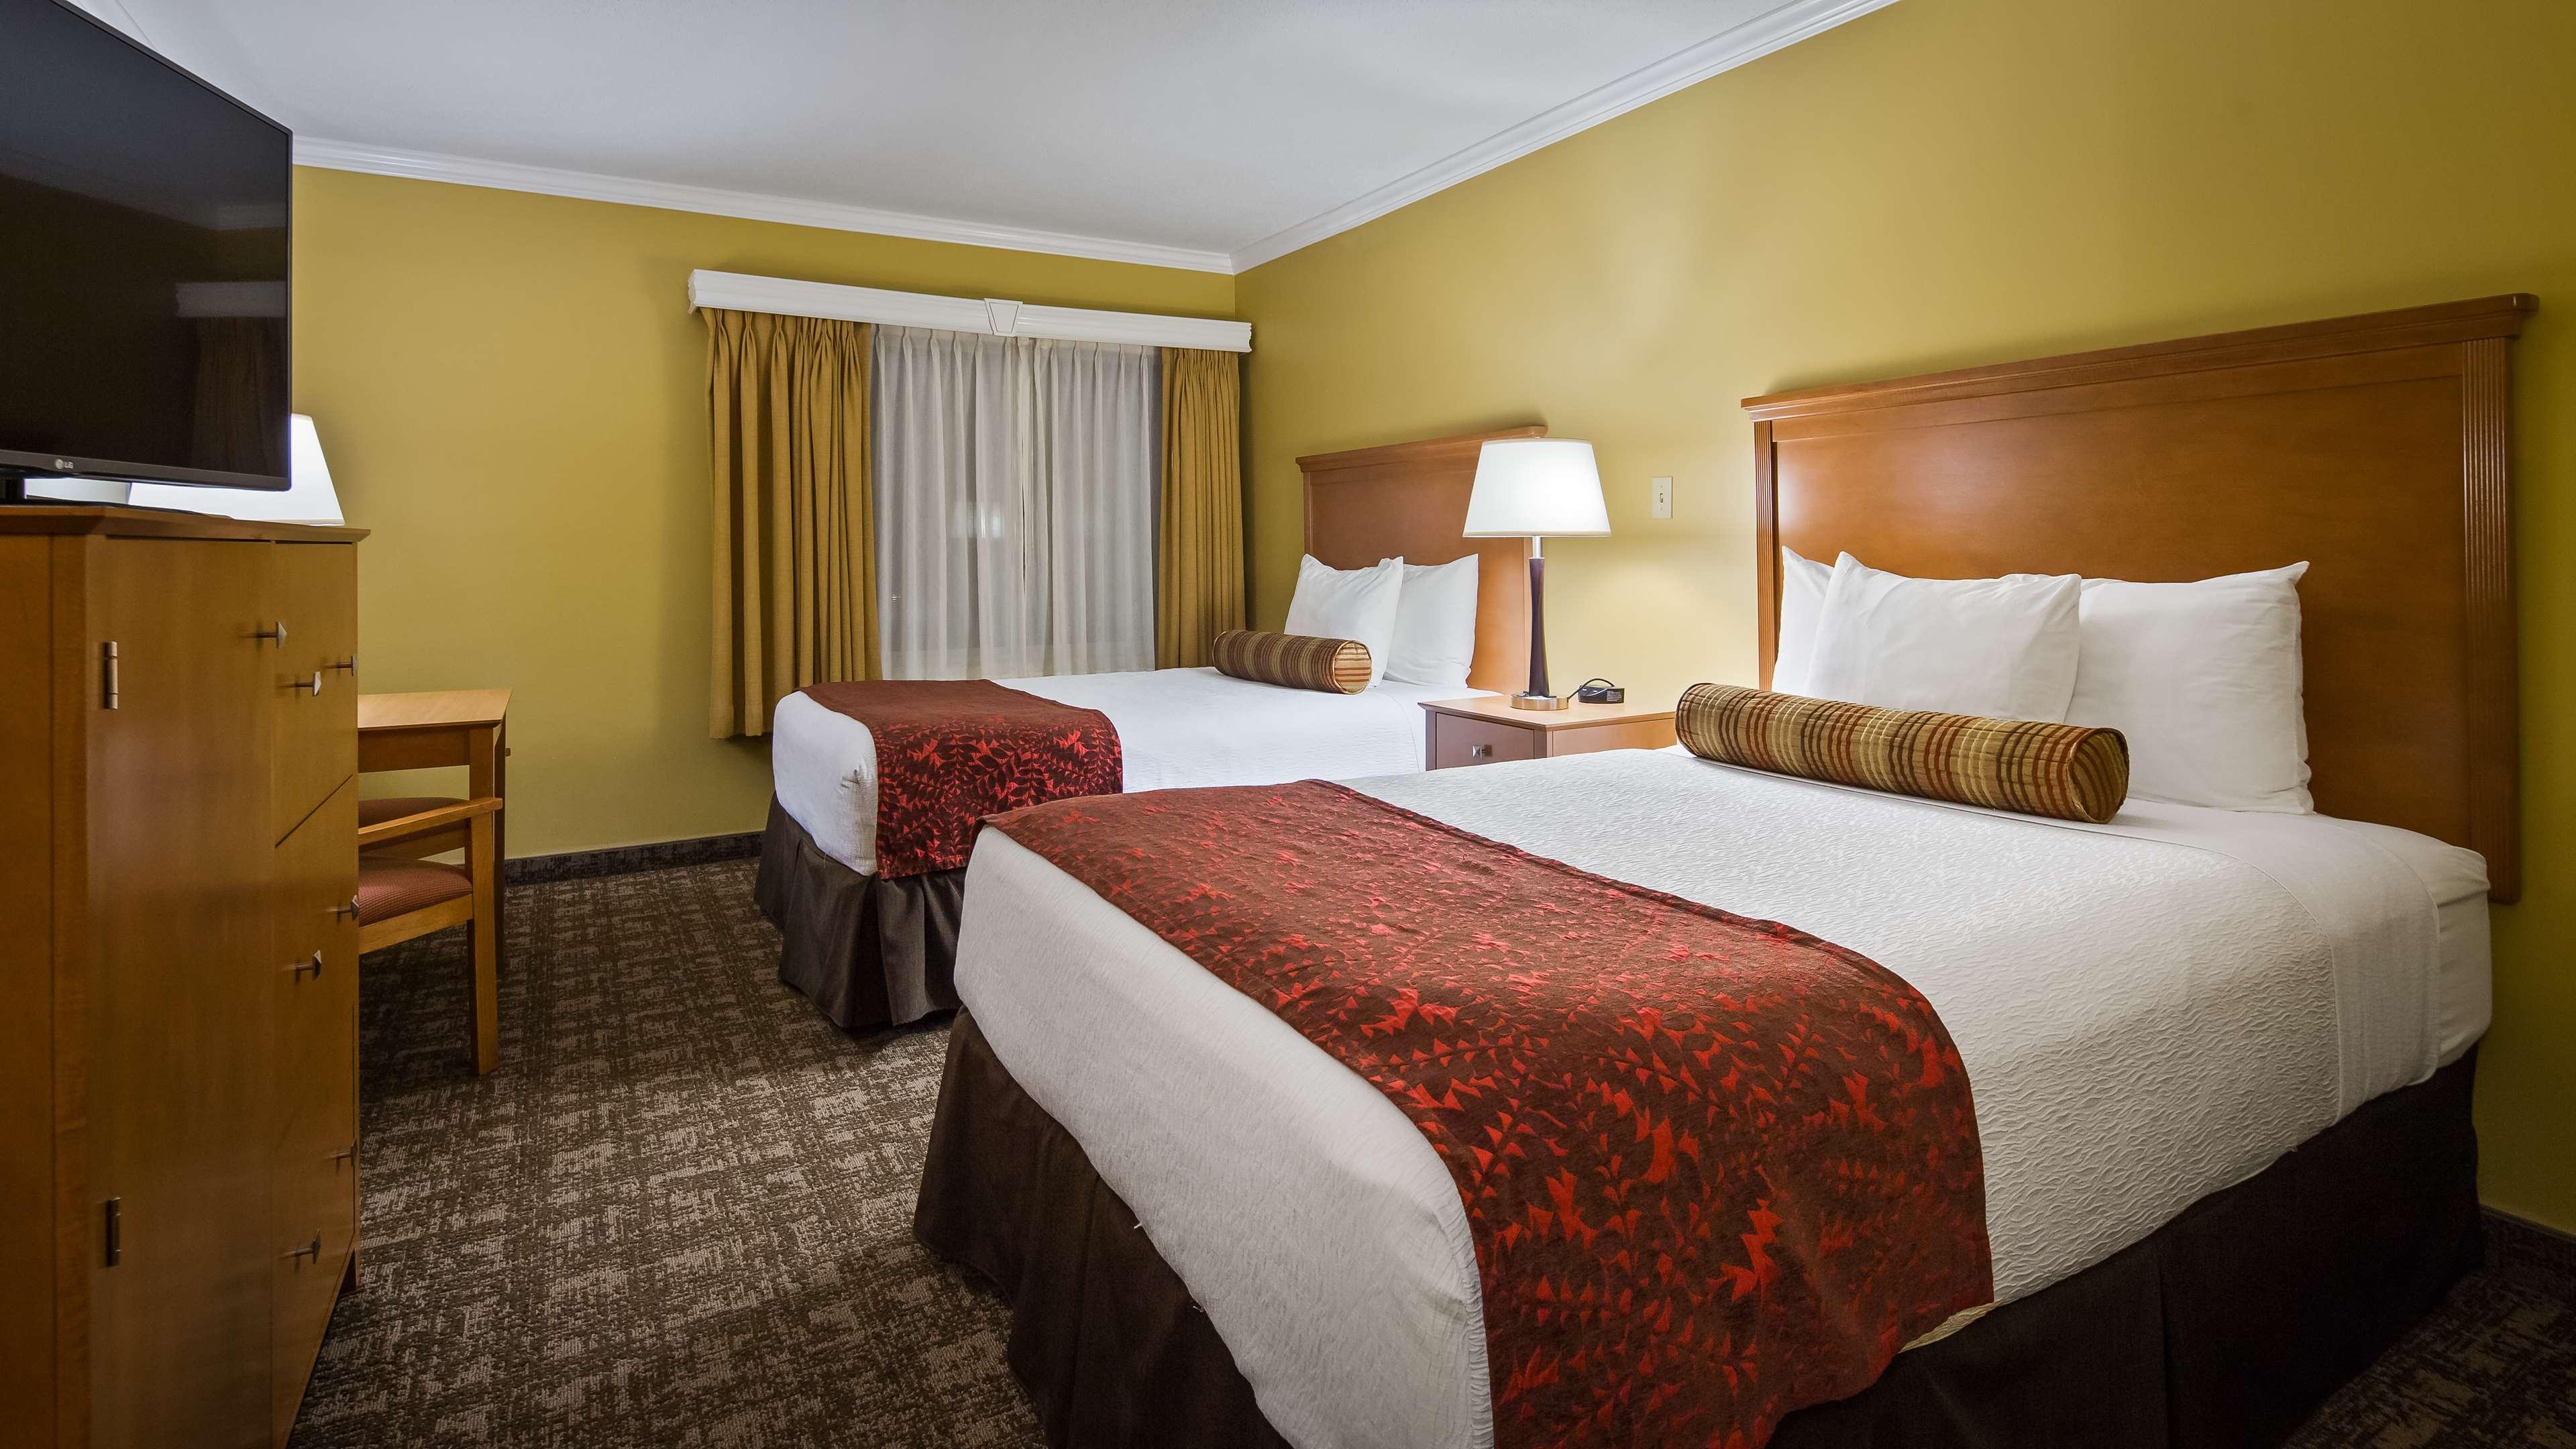 Best Western Plus Windjammer Inn & Conference Center image 16